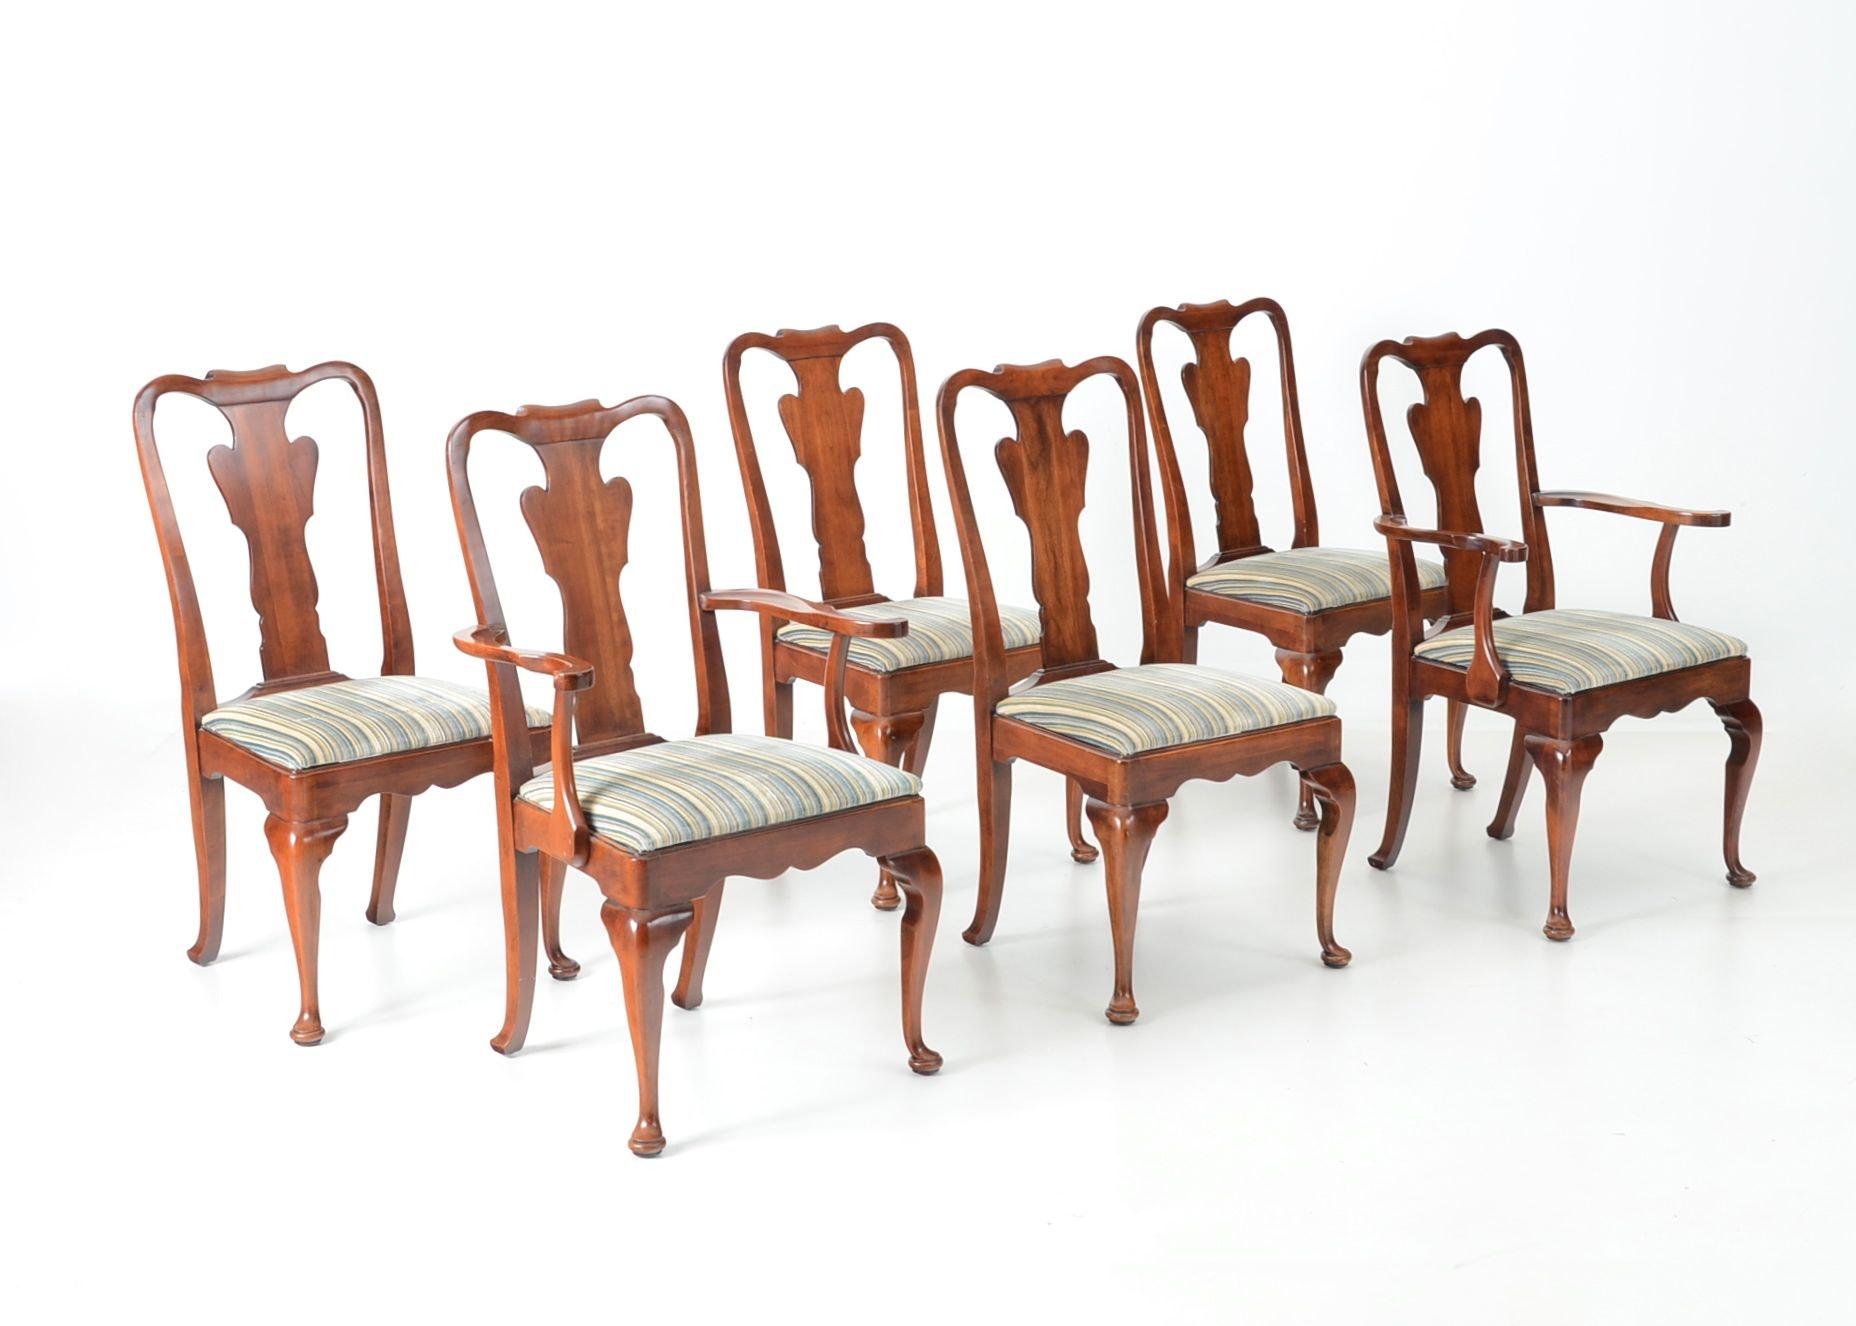 Merveilleux Six Stratton Furniture Chairs ...